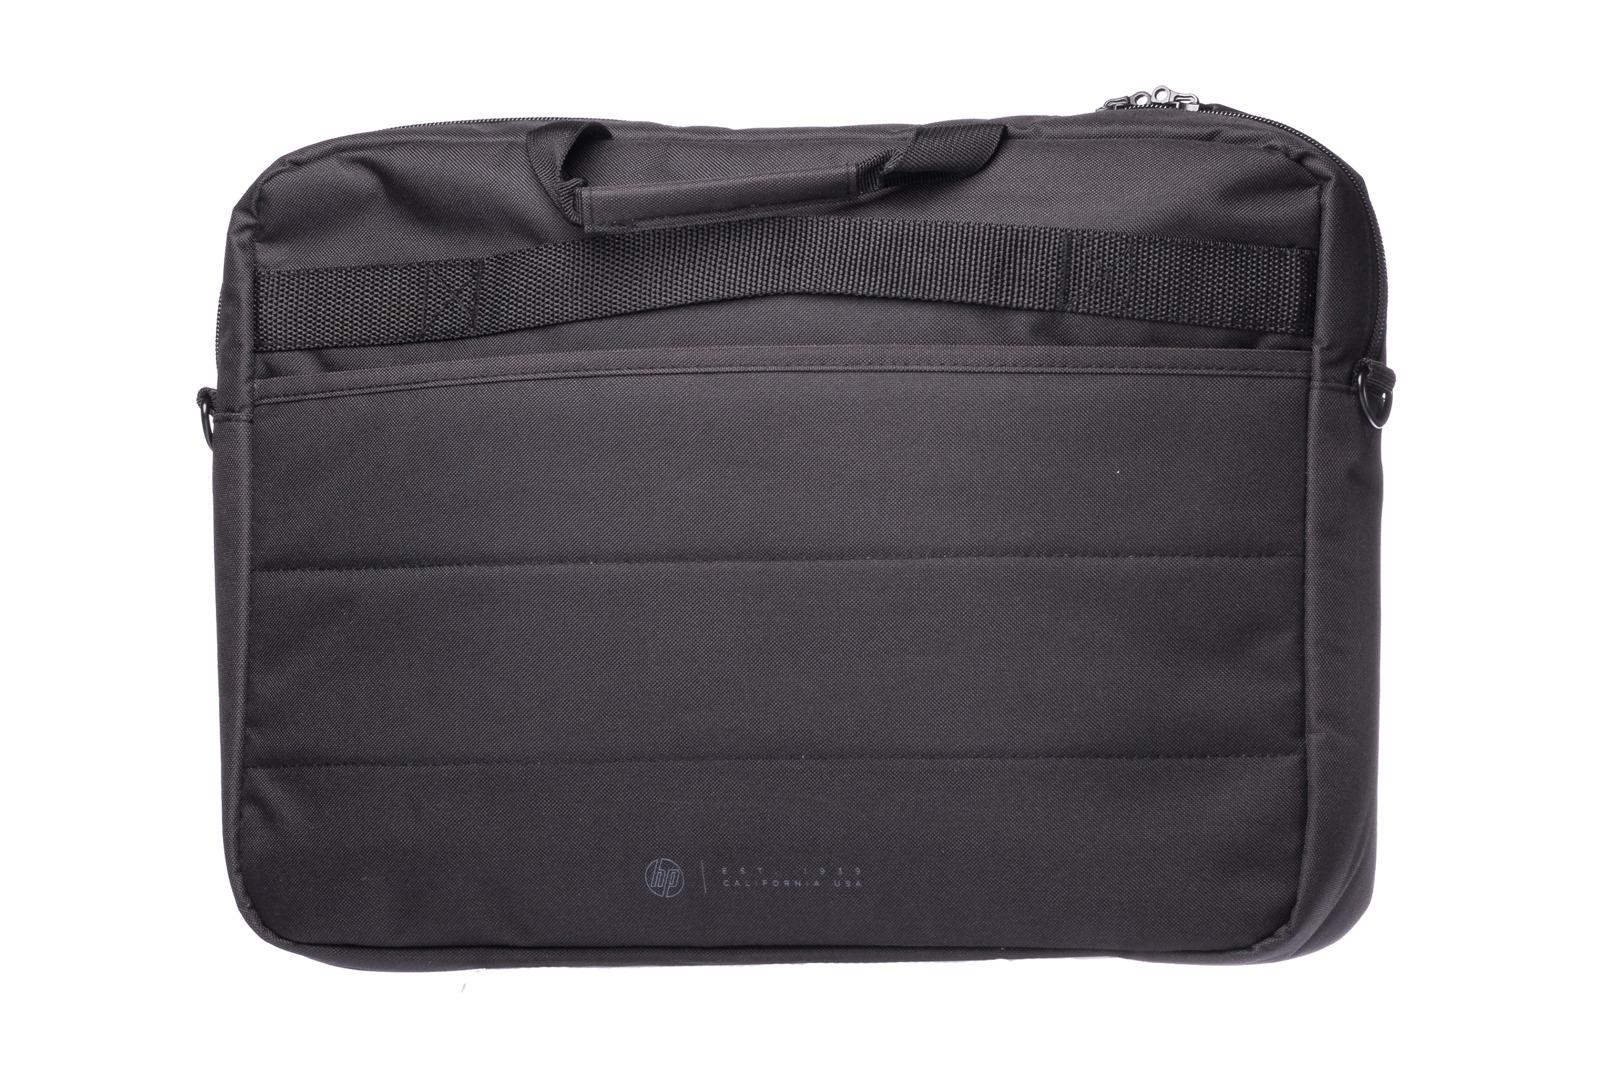 HP Business Slim Top Load Case 17.3 L09238-001 Laptoptasche